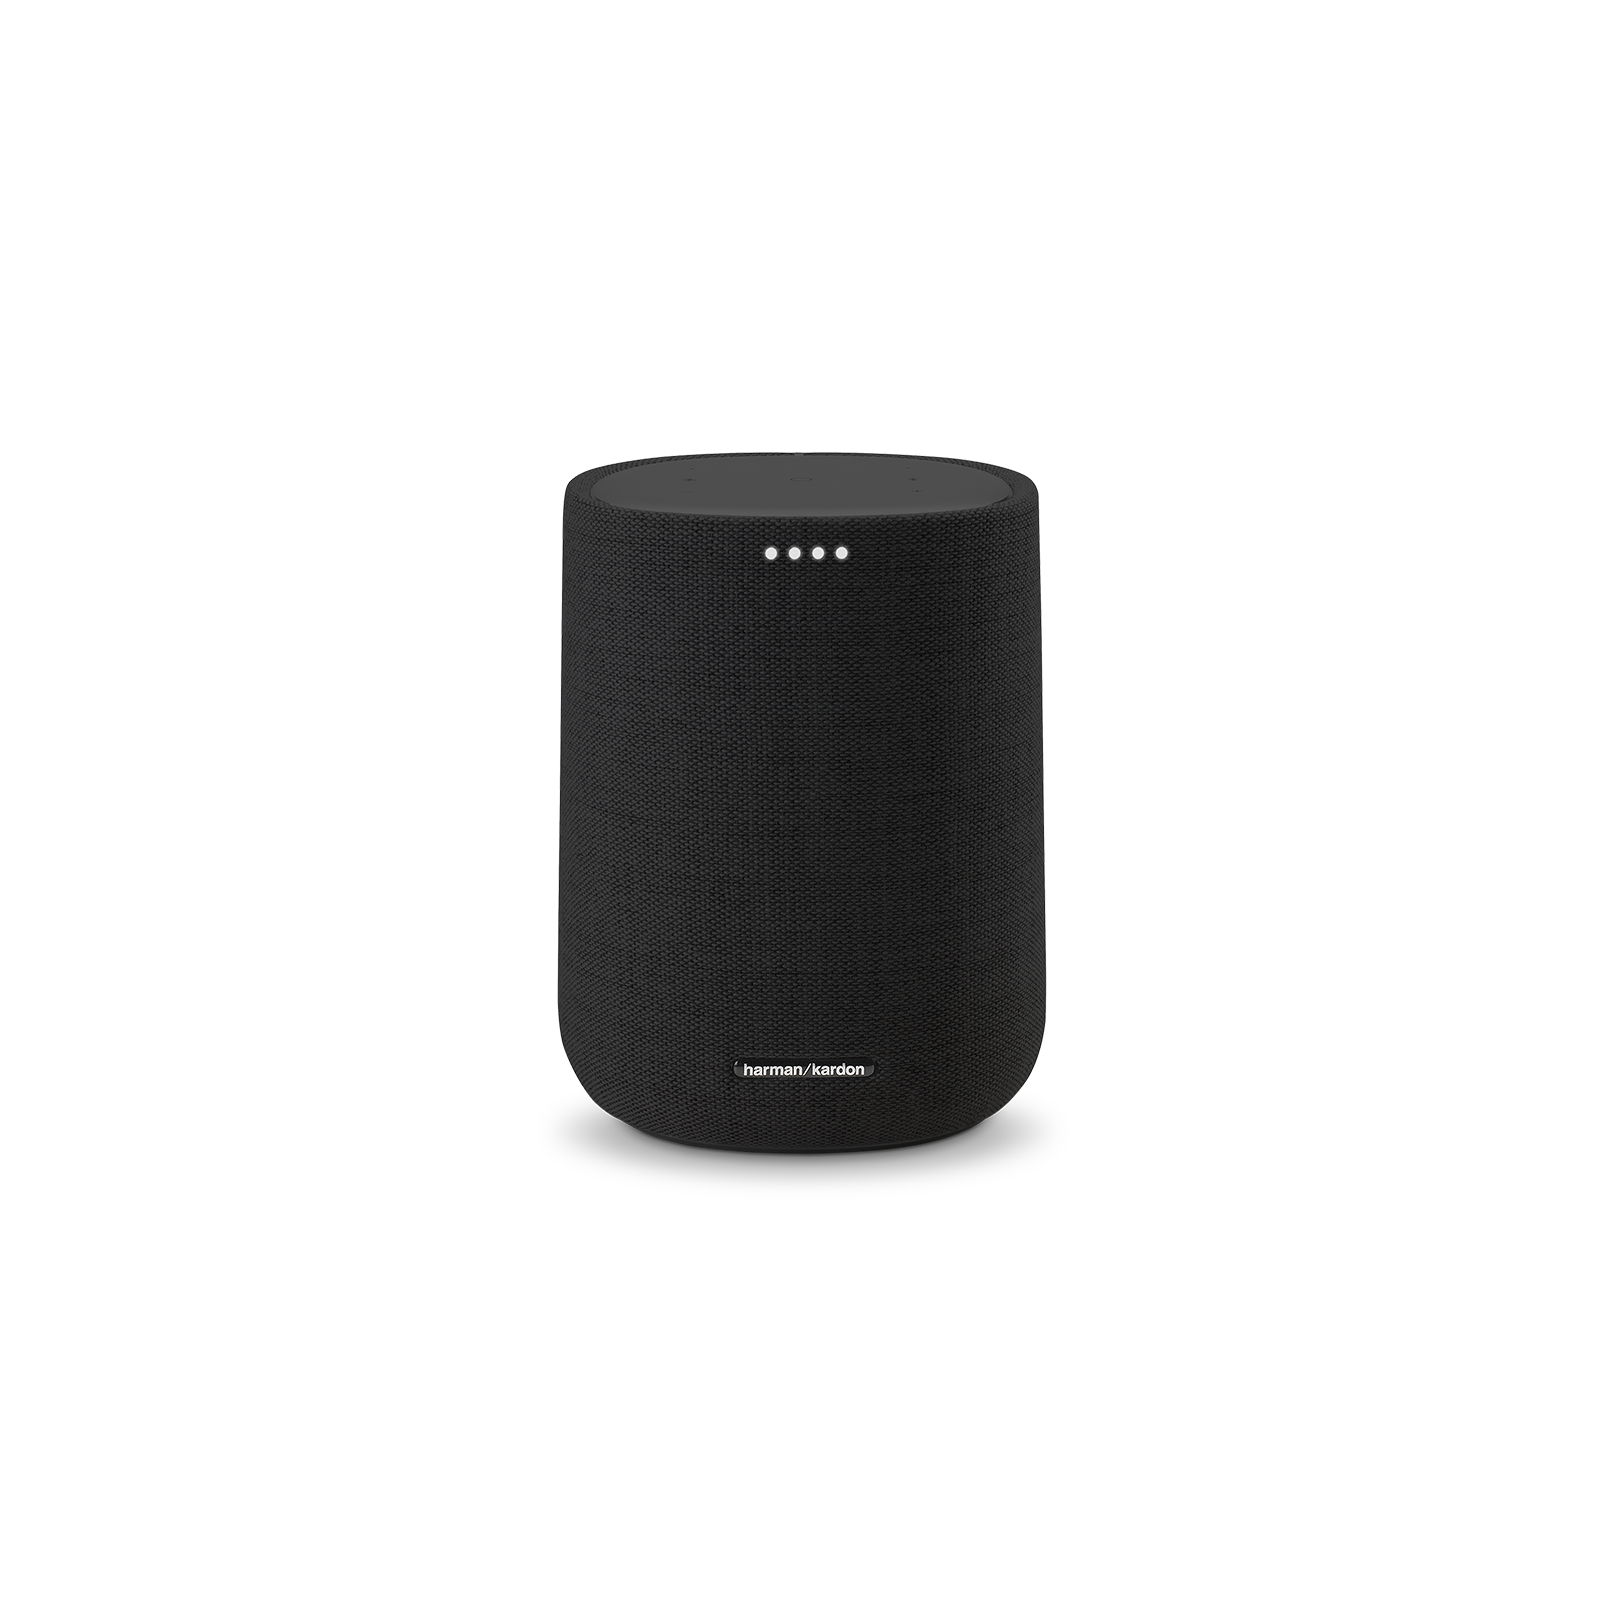 Harman Kardon Citation ONE - Black - Compact, smart and amazing sound - Front